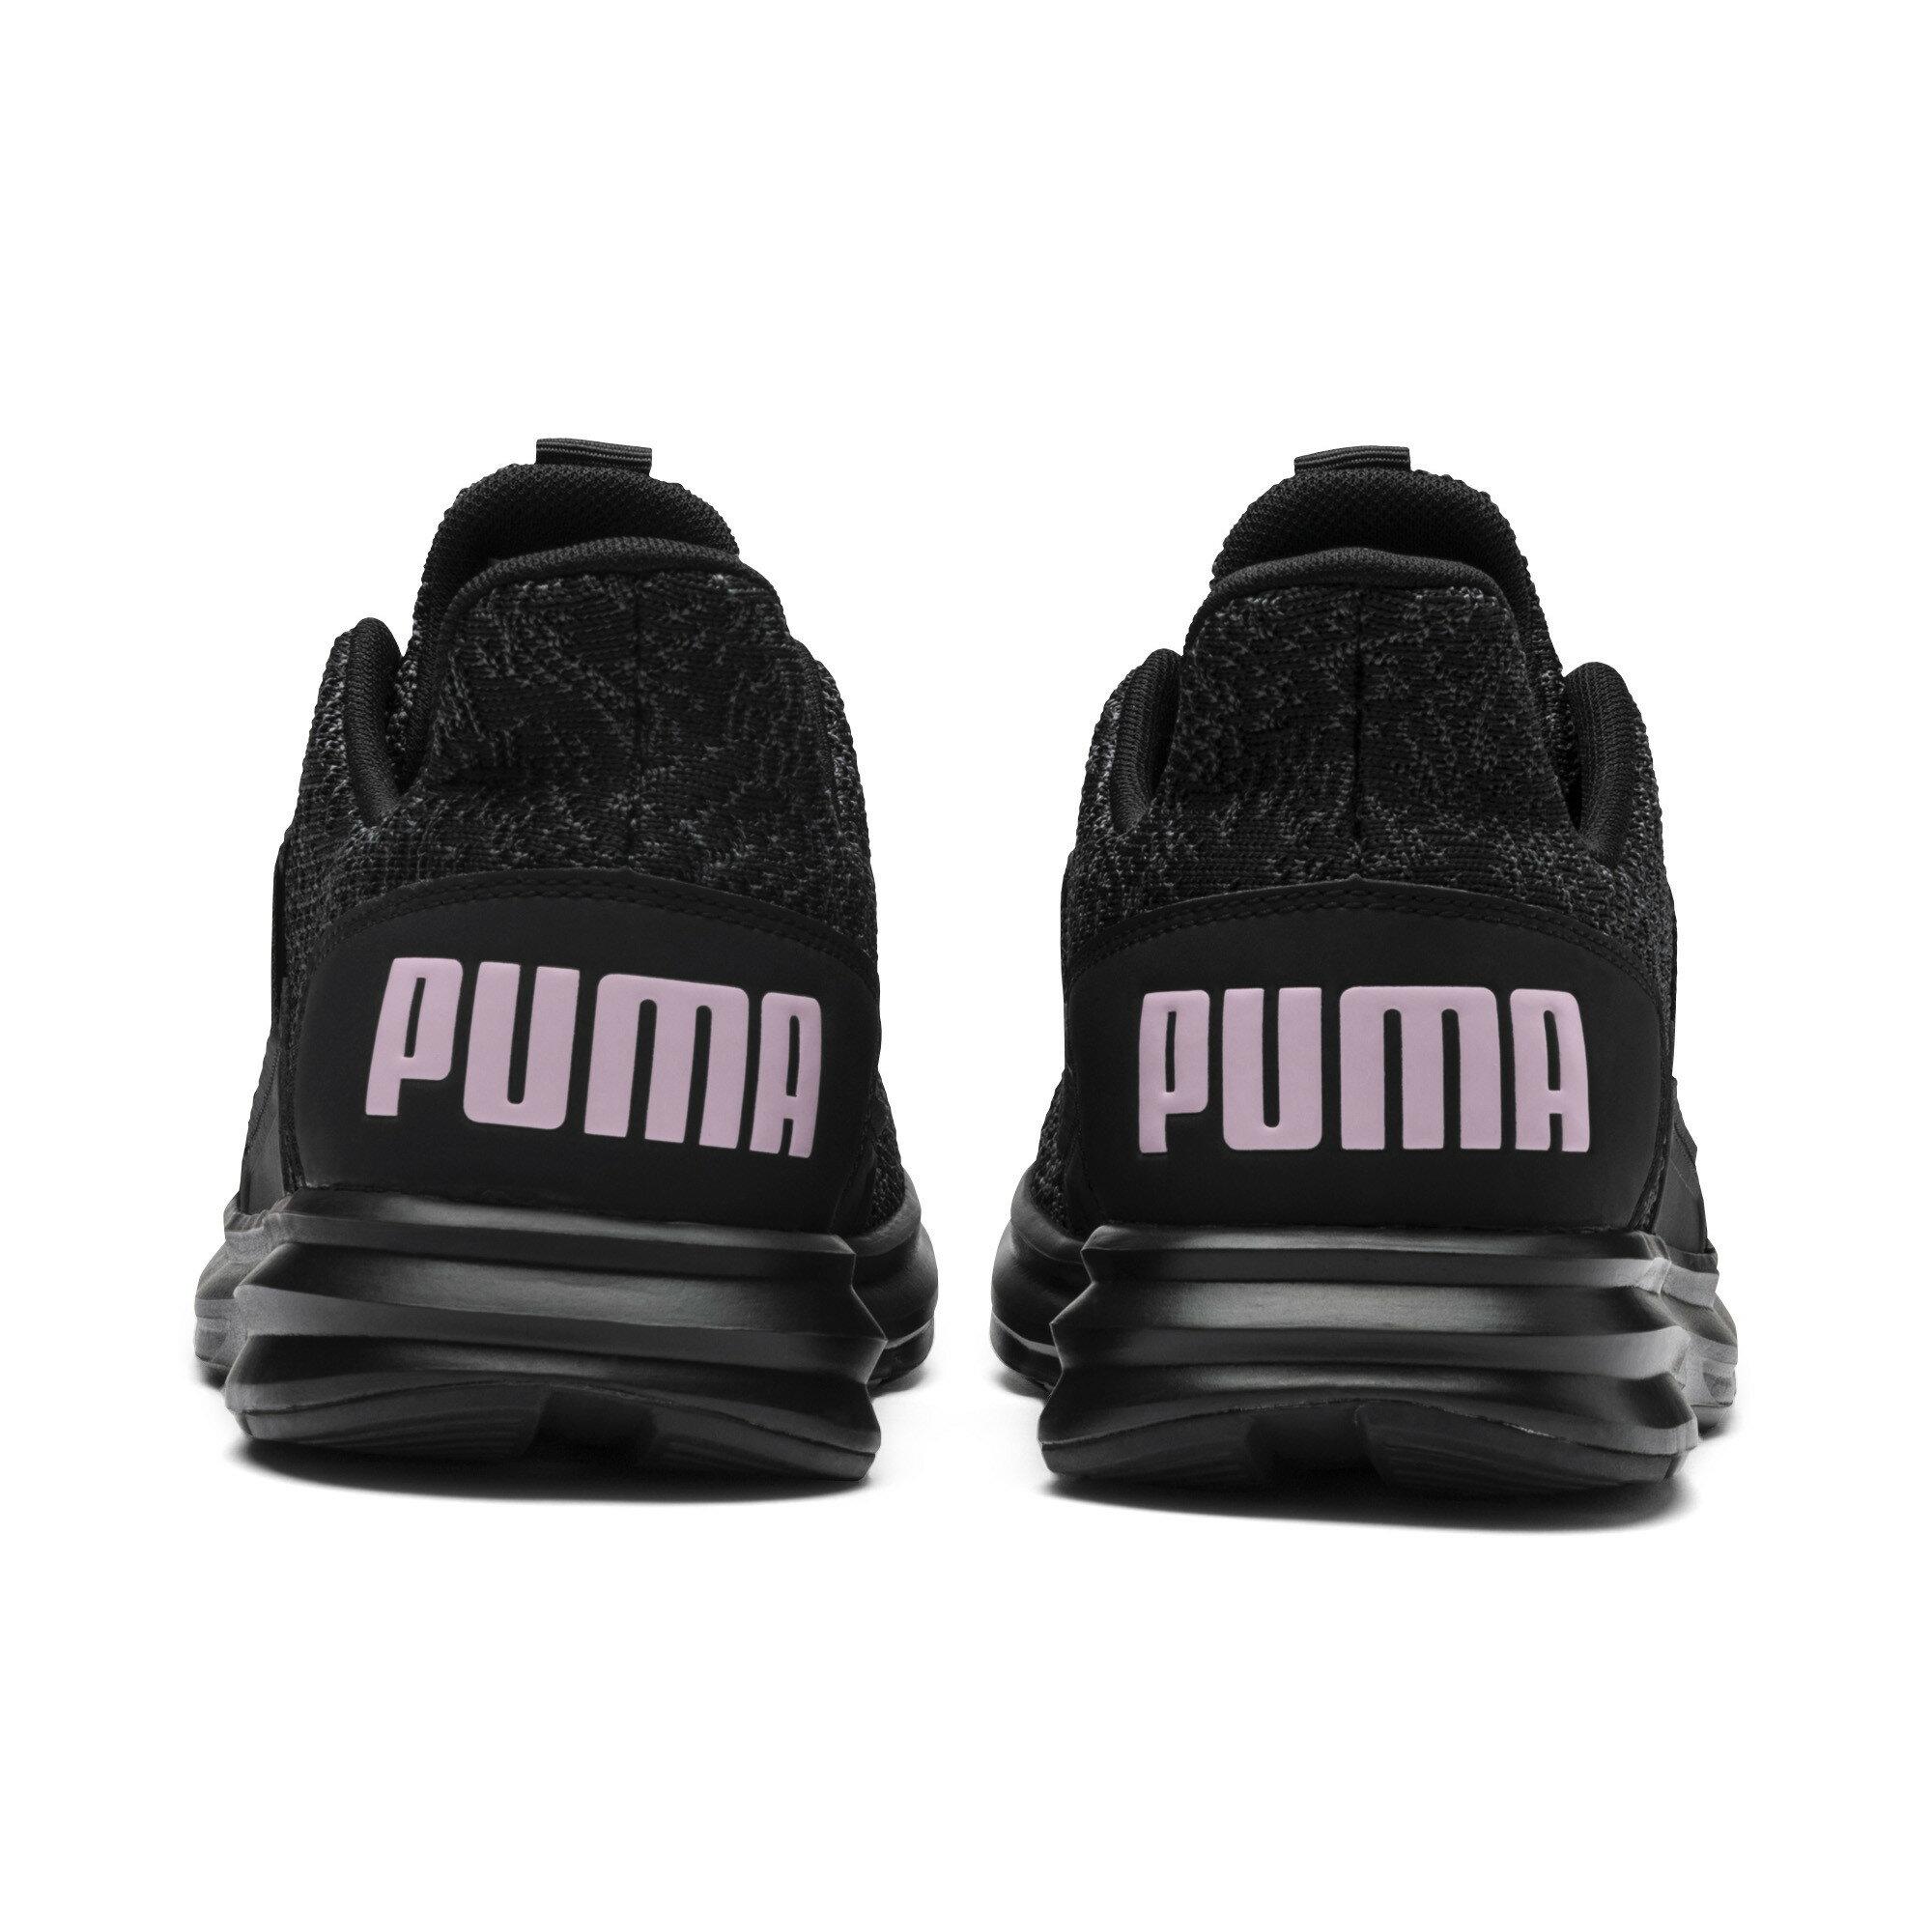 dabf00e4754d6f Official Puma Store  PUMA Enzo Street Knit Interest Women s ...